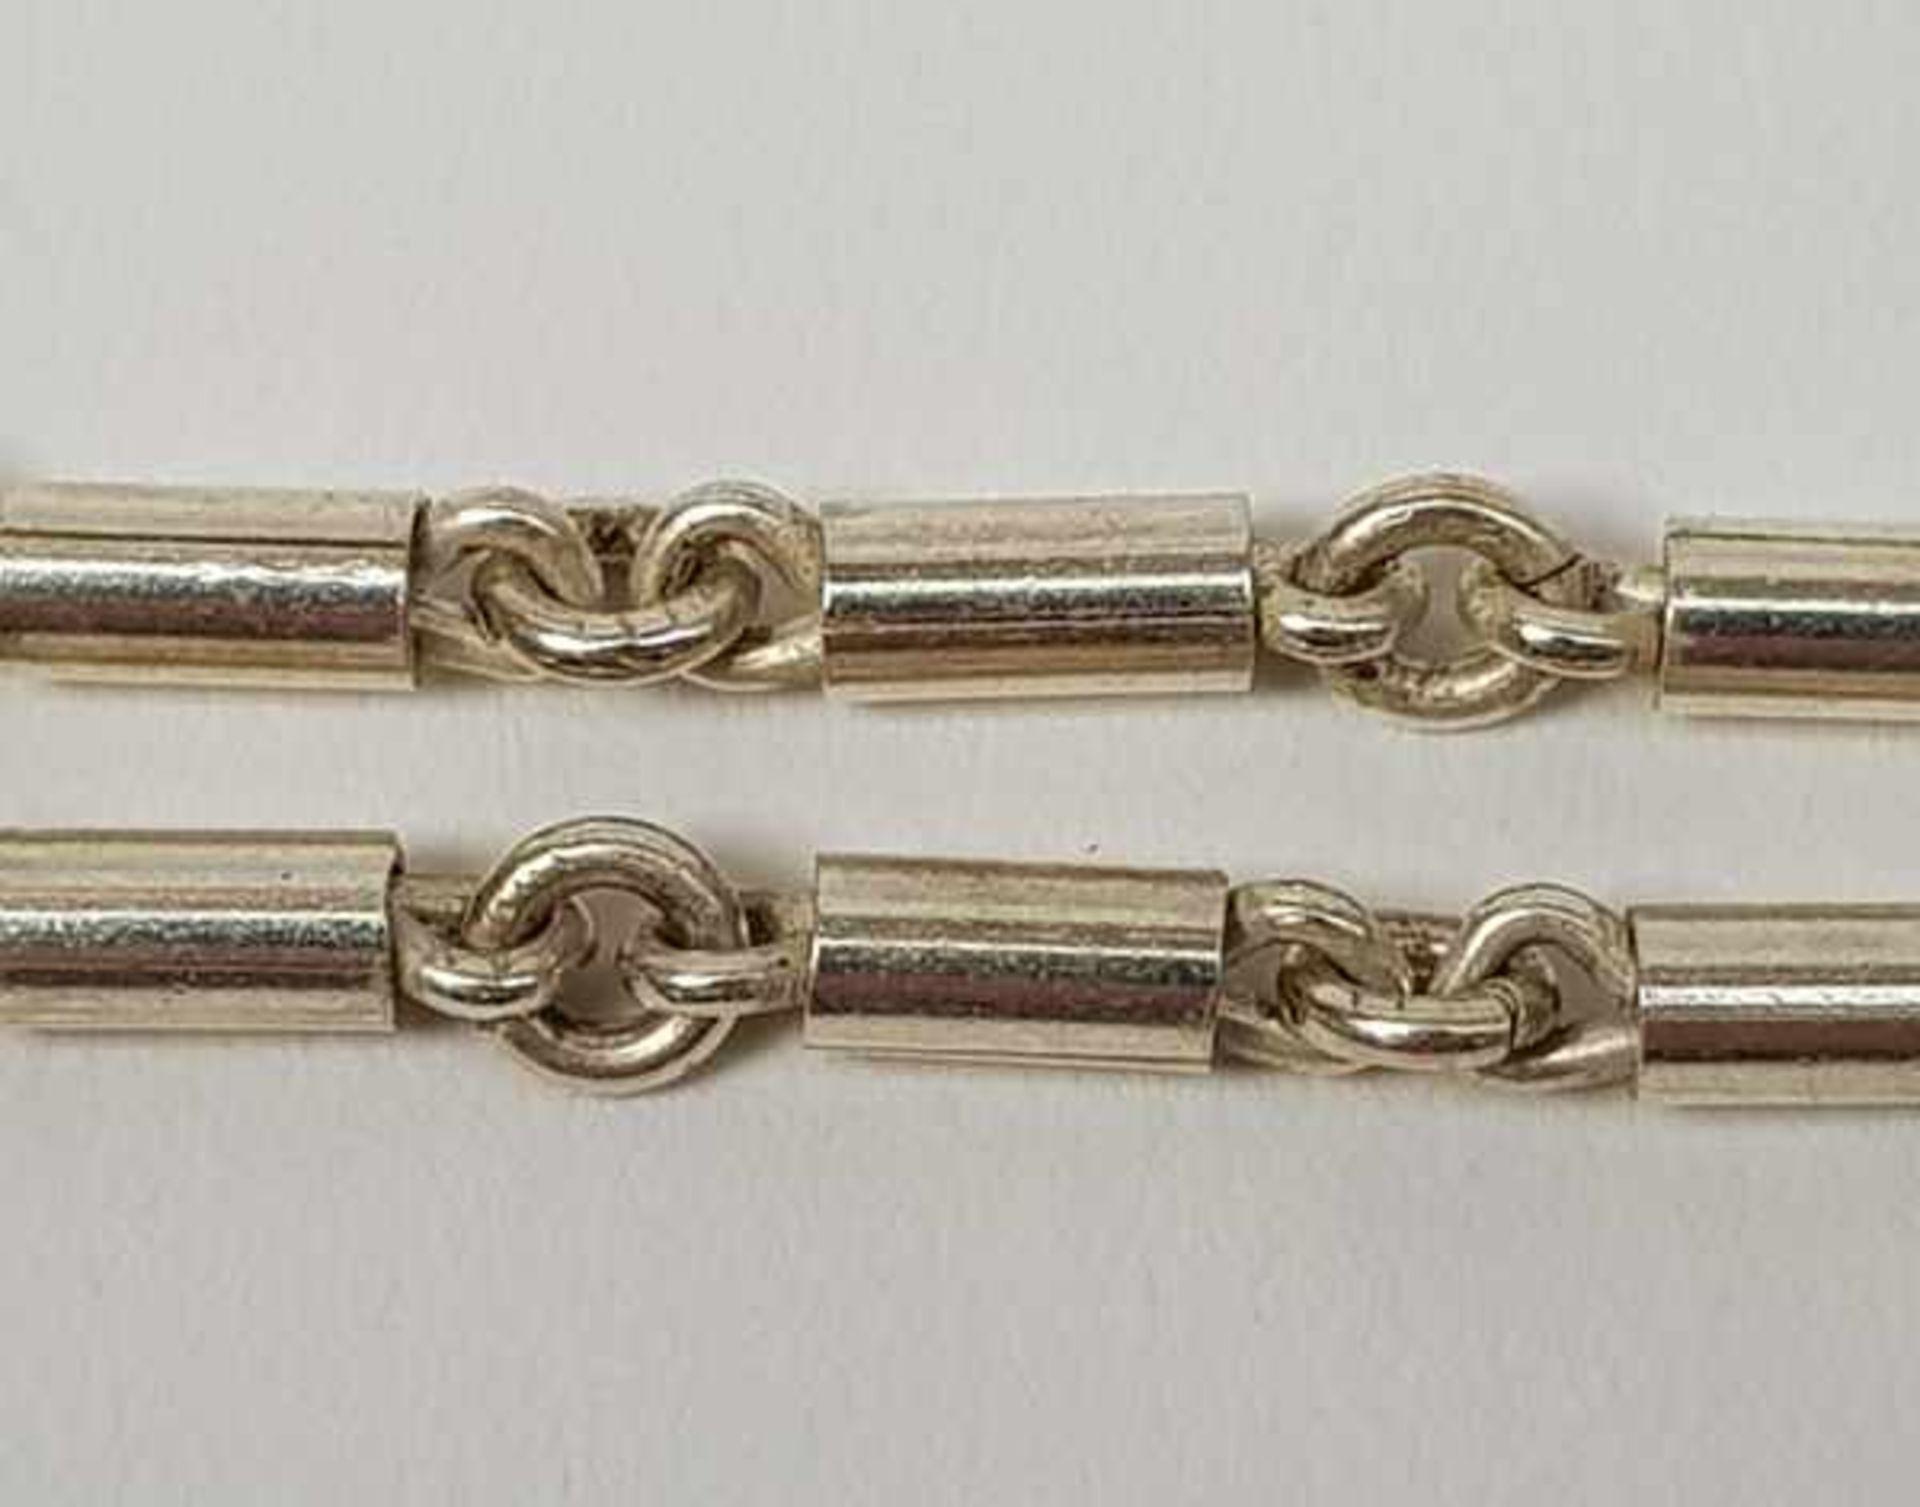 (Sieraden) Zilver + emaille. Armband en halsketting. o.a. Mexico - Image 7 of 7